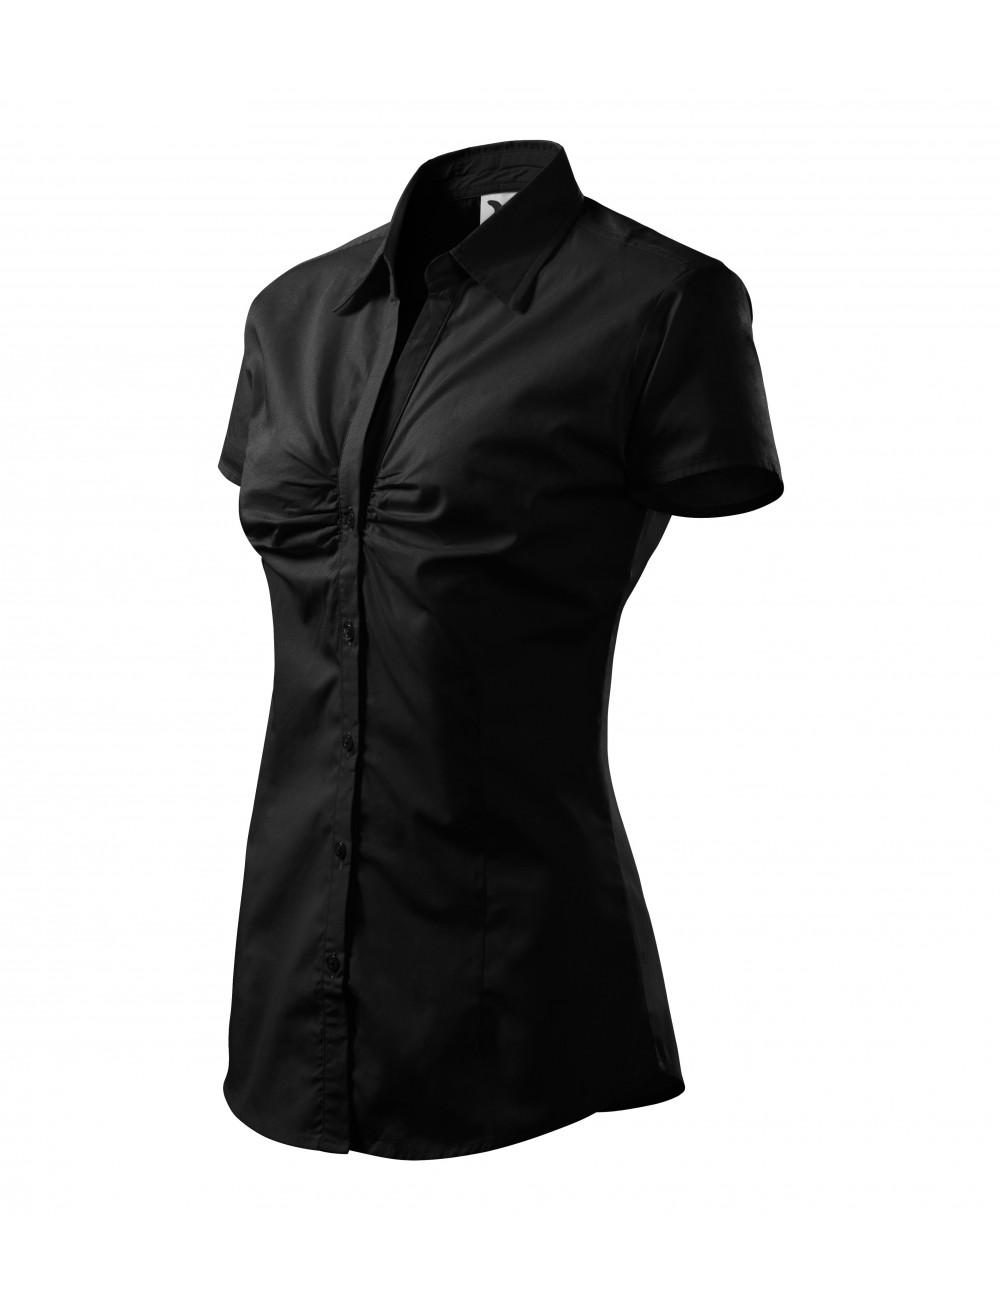 Adler MALFINI Koszula damska Chic 214 czarny